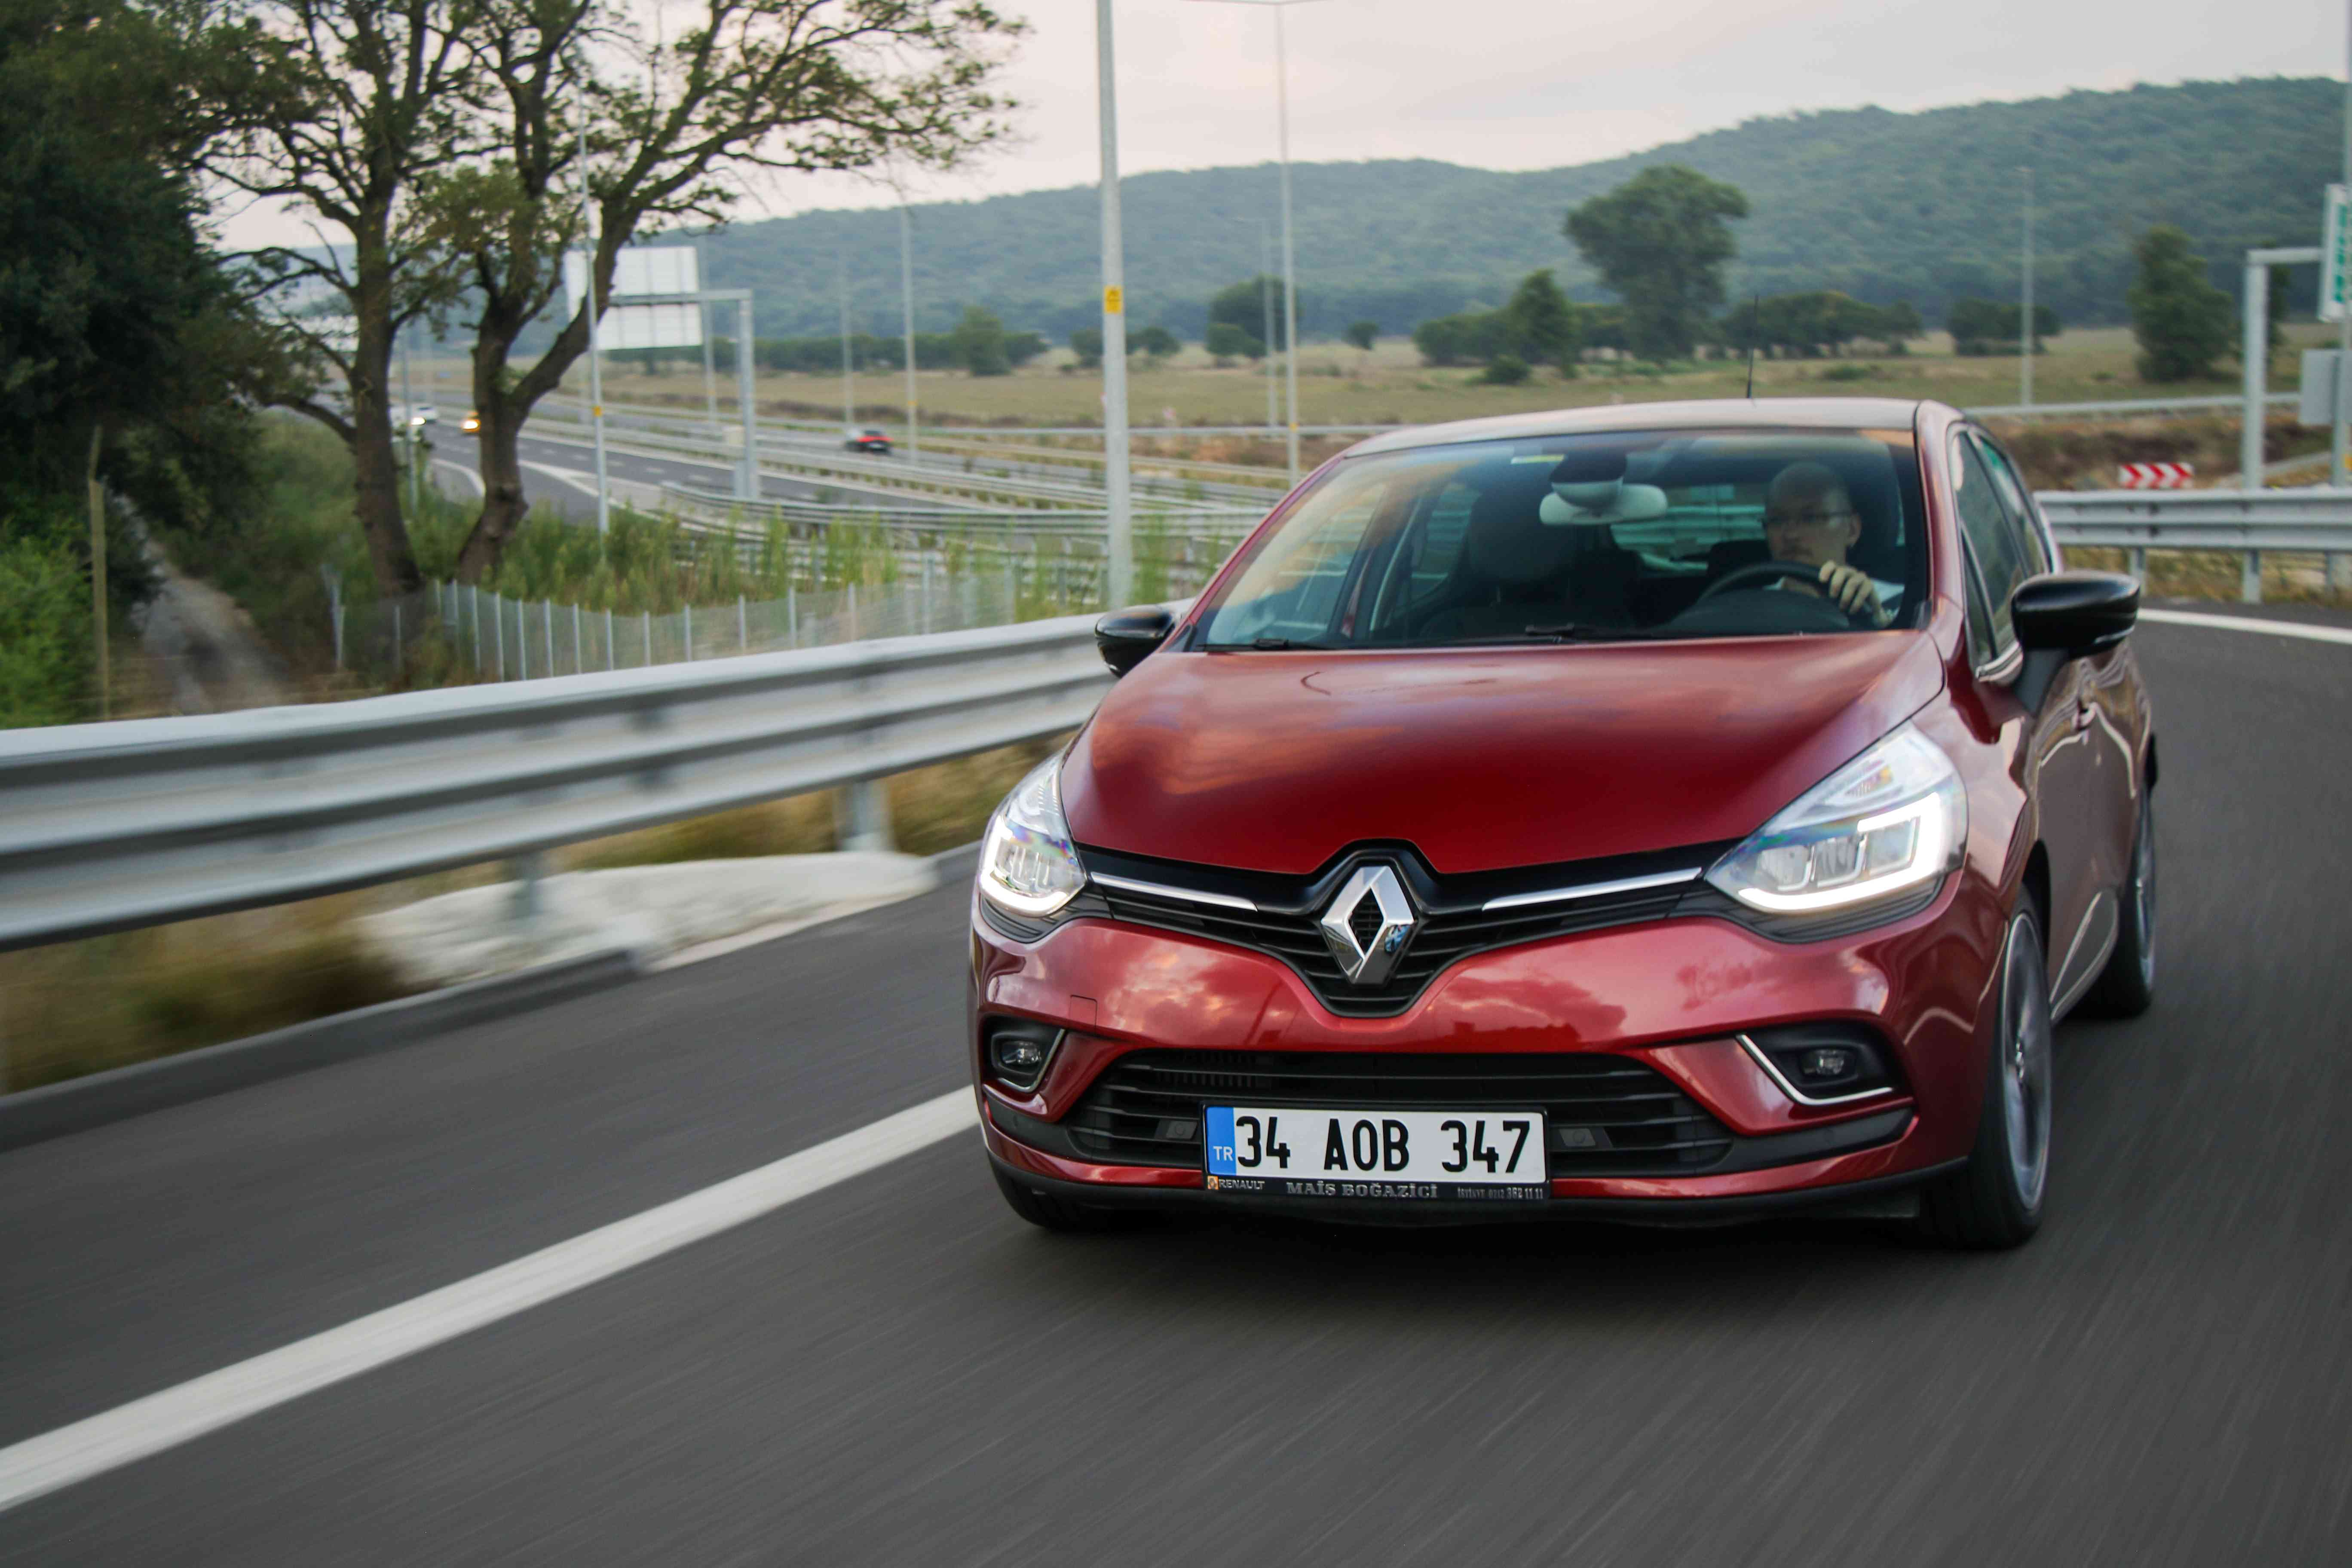 Renault Clio IV Grandtour 1.2 TCe